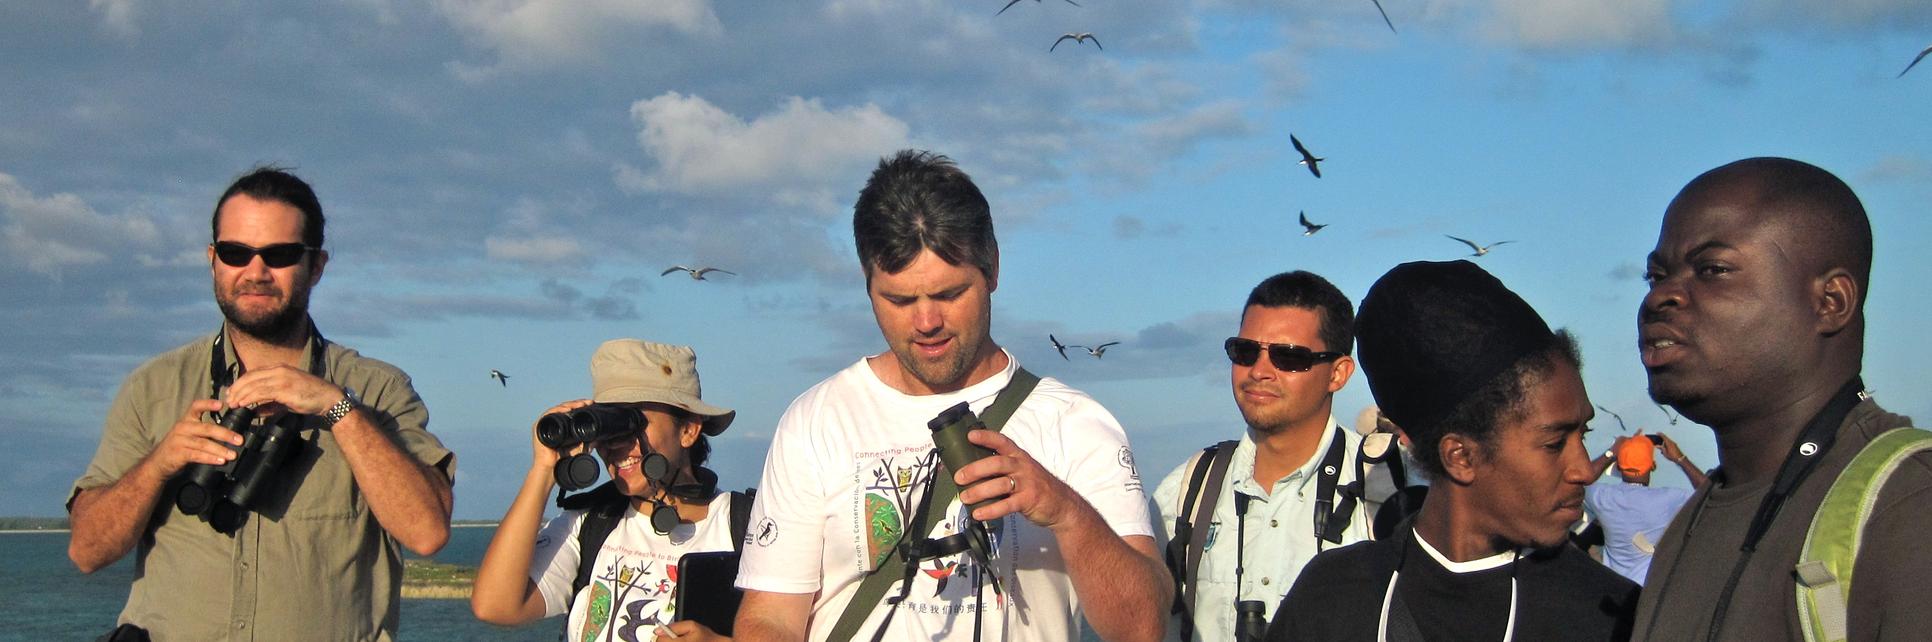 Monitoring seabirds with birdscaribbean, san salvador, bahamas